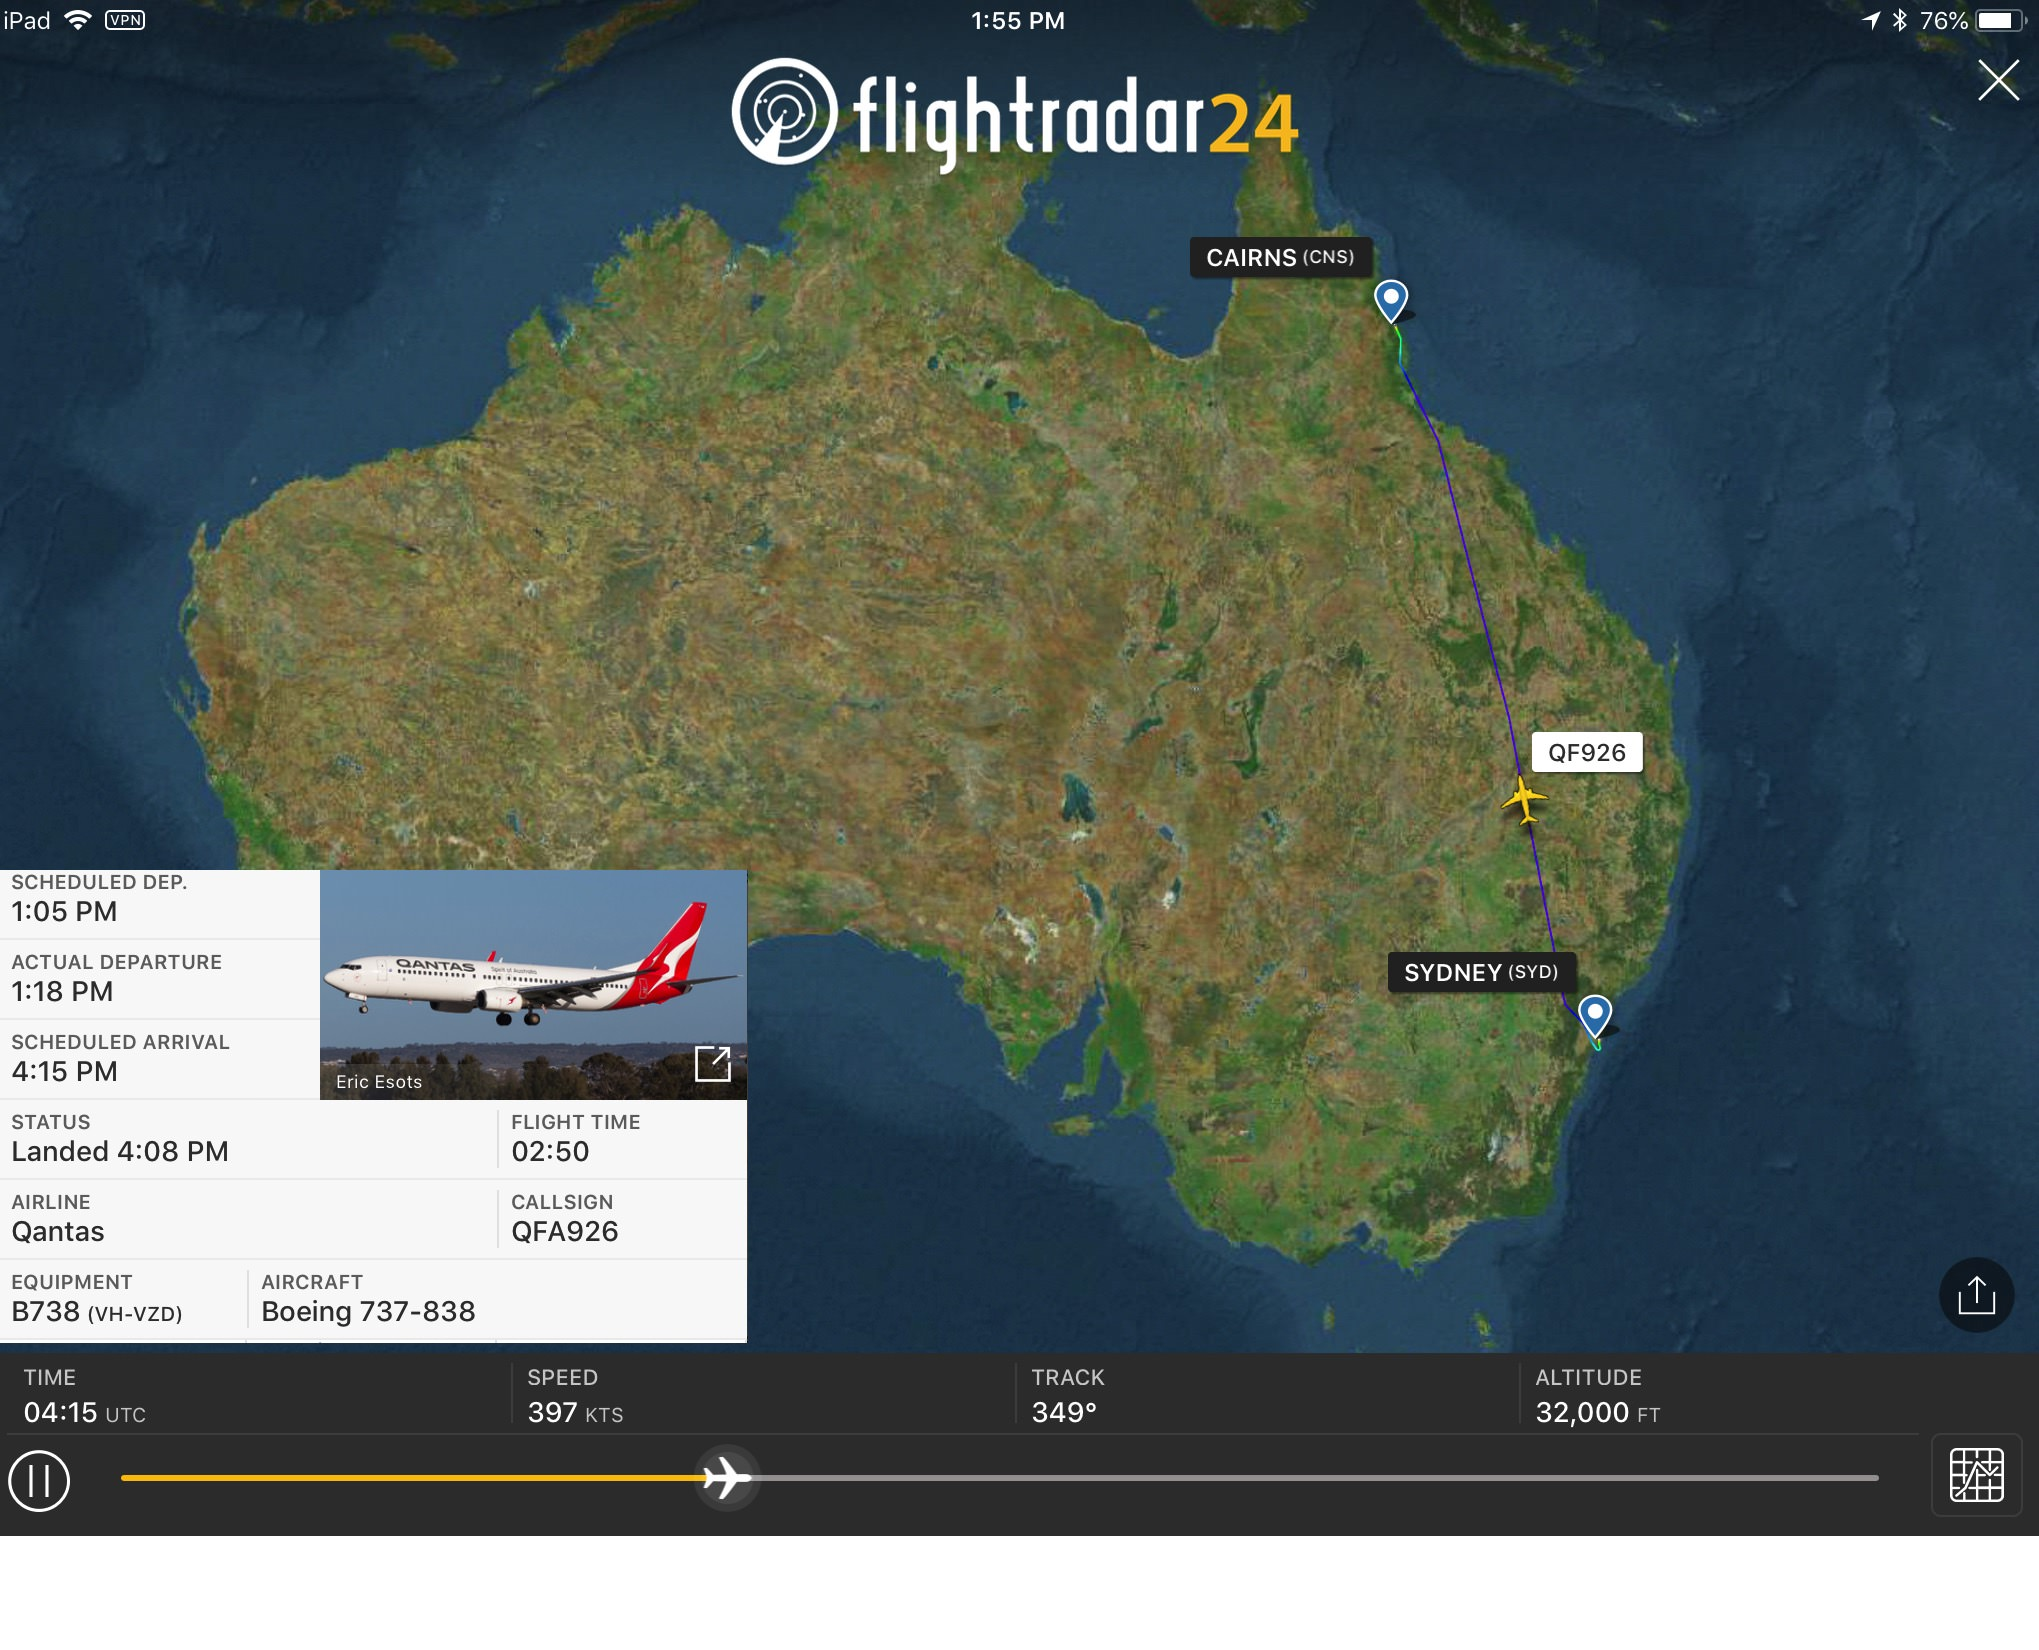 QF926 Flightpath.jpg